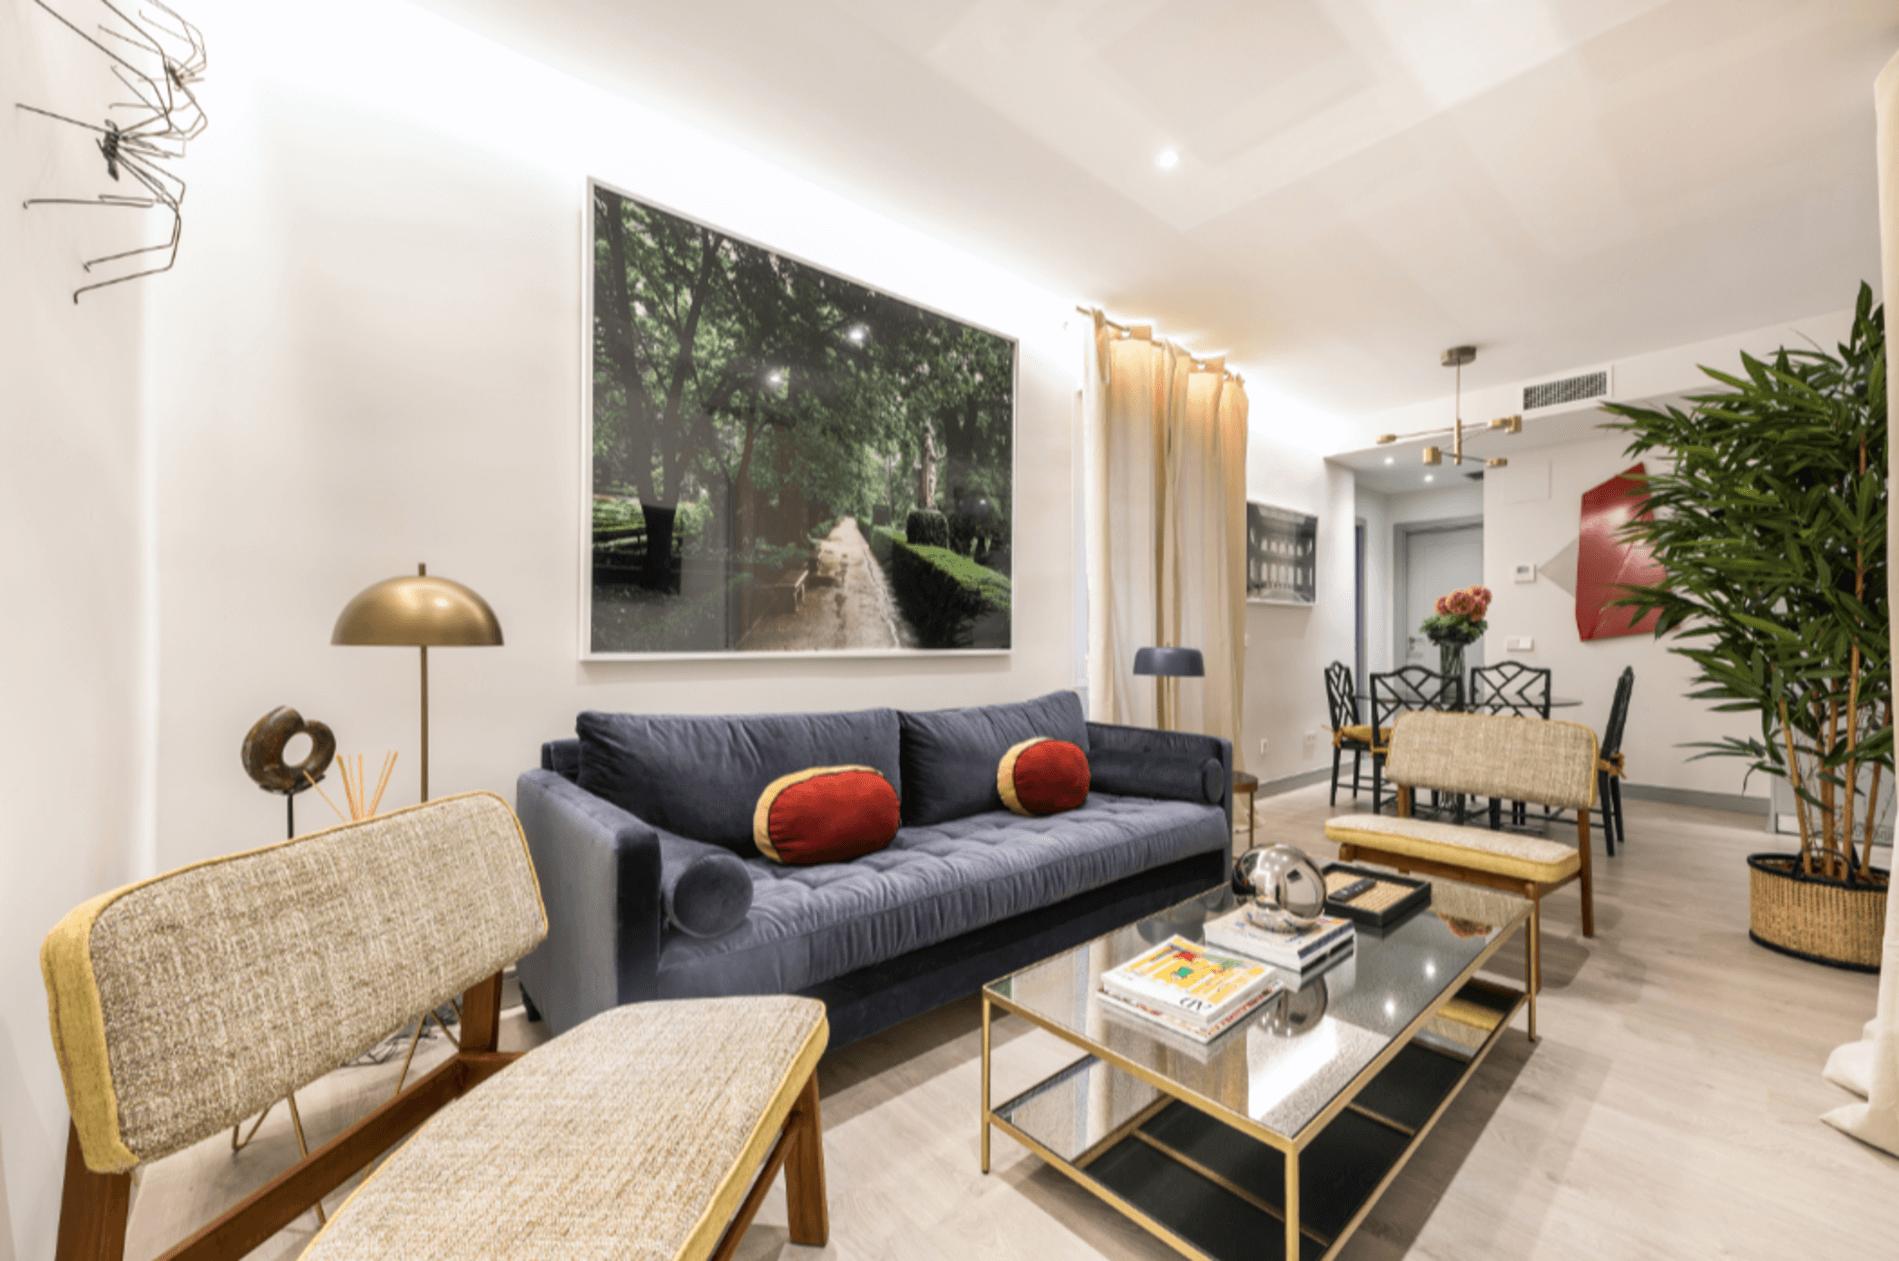 Serviced 2 bedroom apartment in Salamanca, Madrid